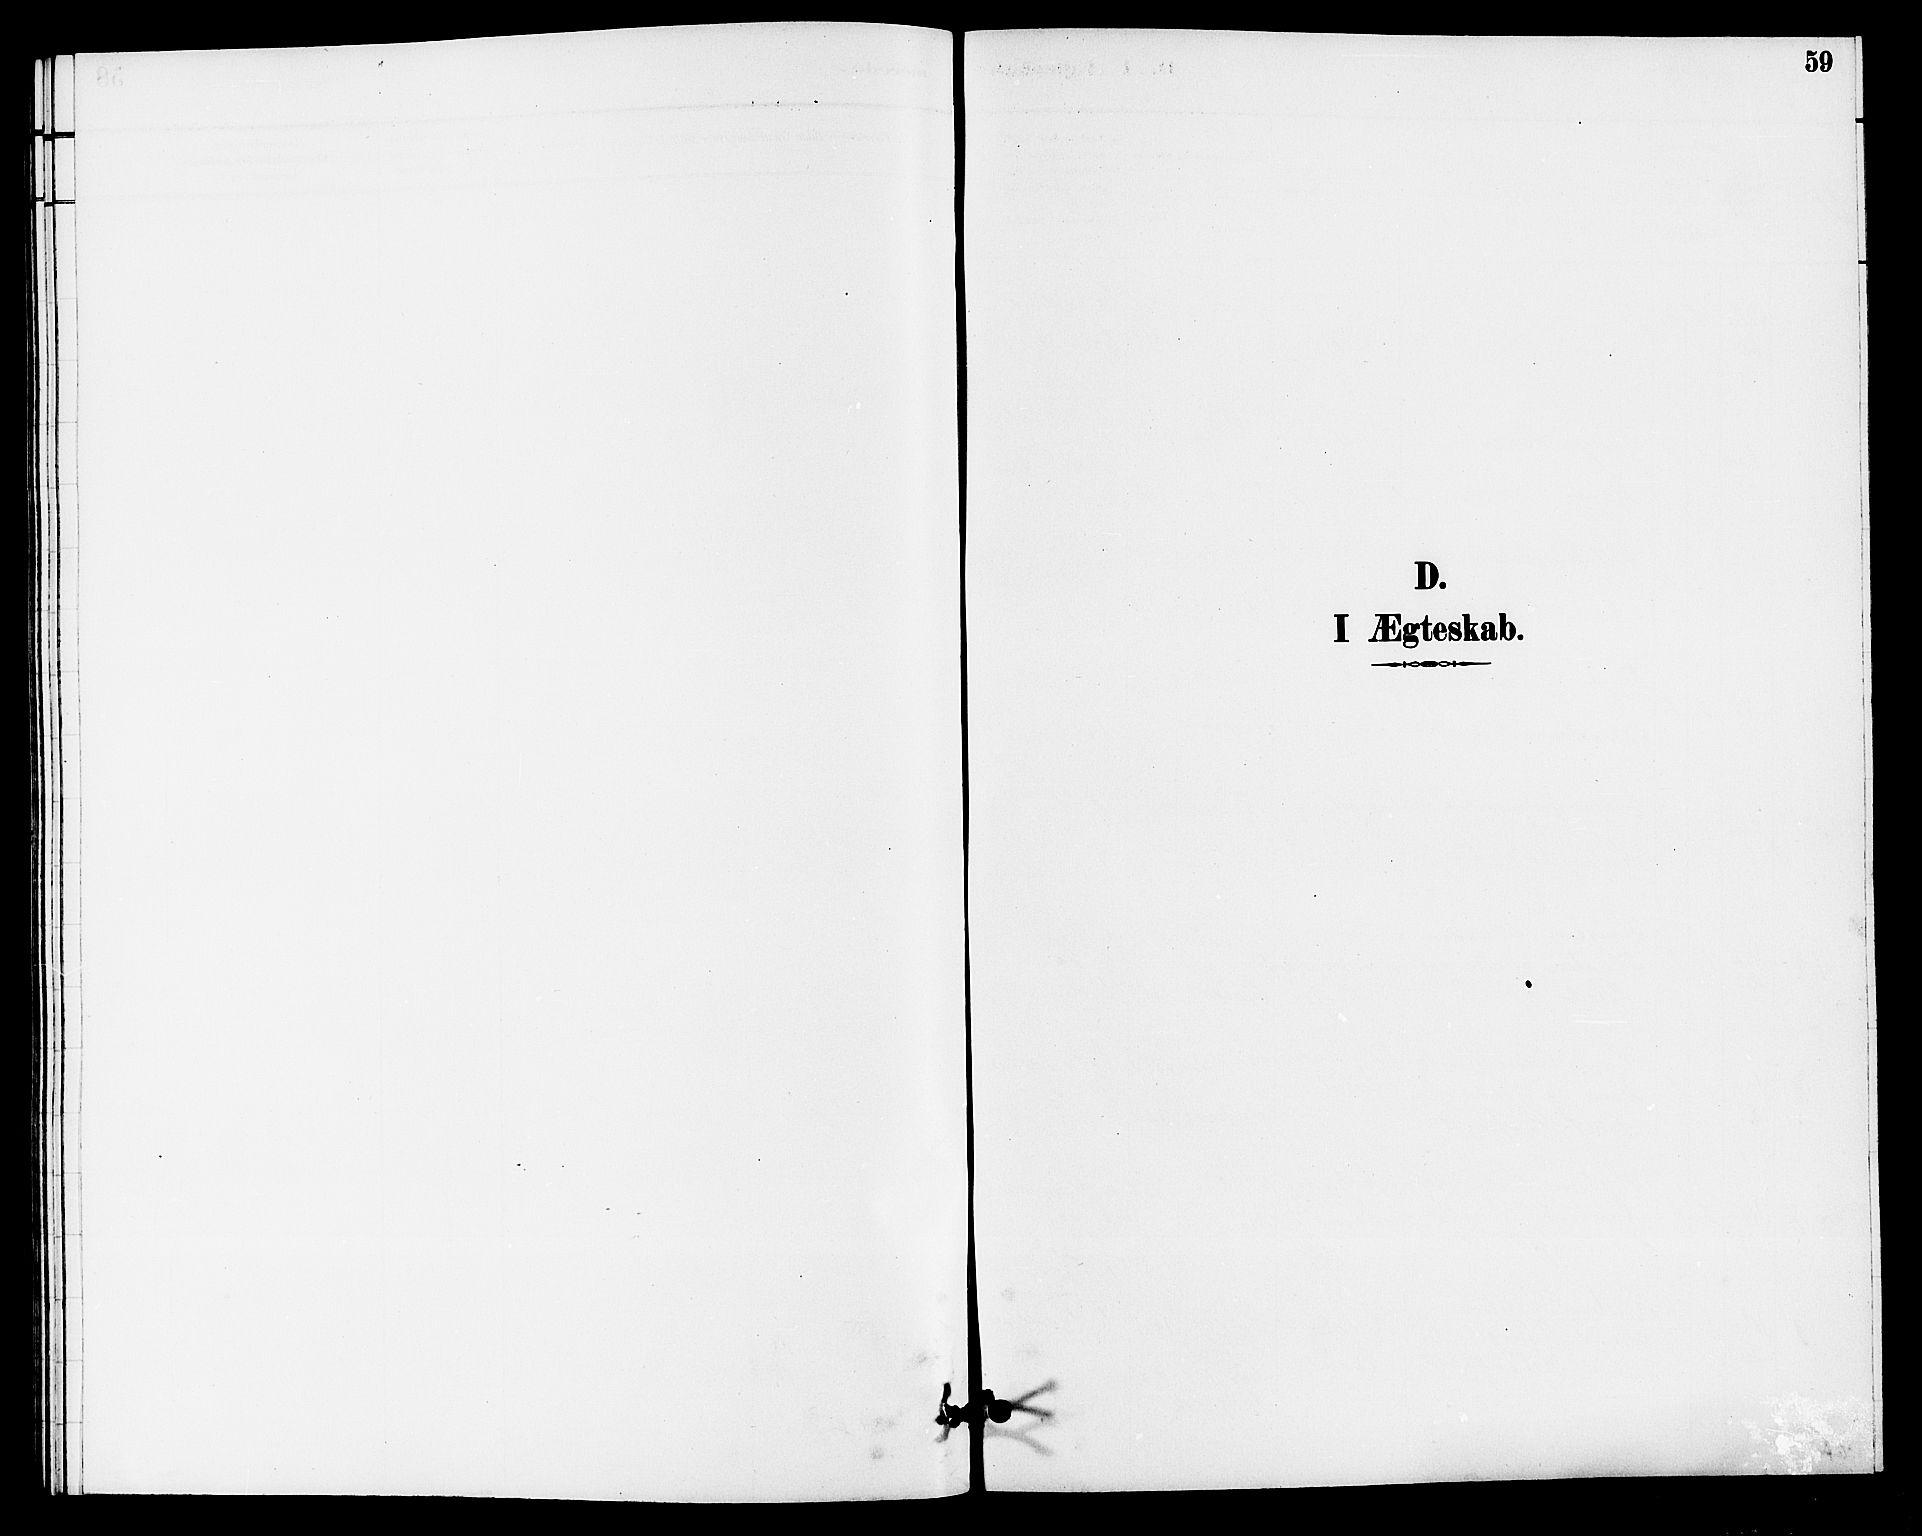 SAKO, Hjartdal kirkebøker, G/Gb/L0003: Klokkerbok nr. II 3, 1884-1899, s. 59